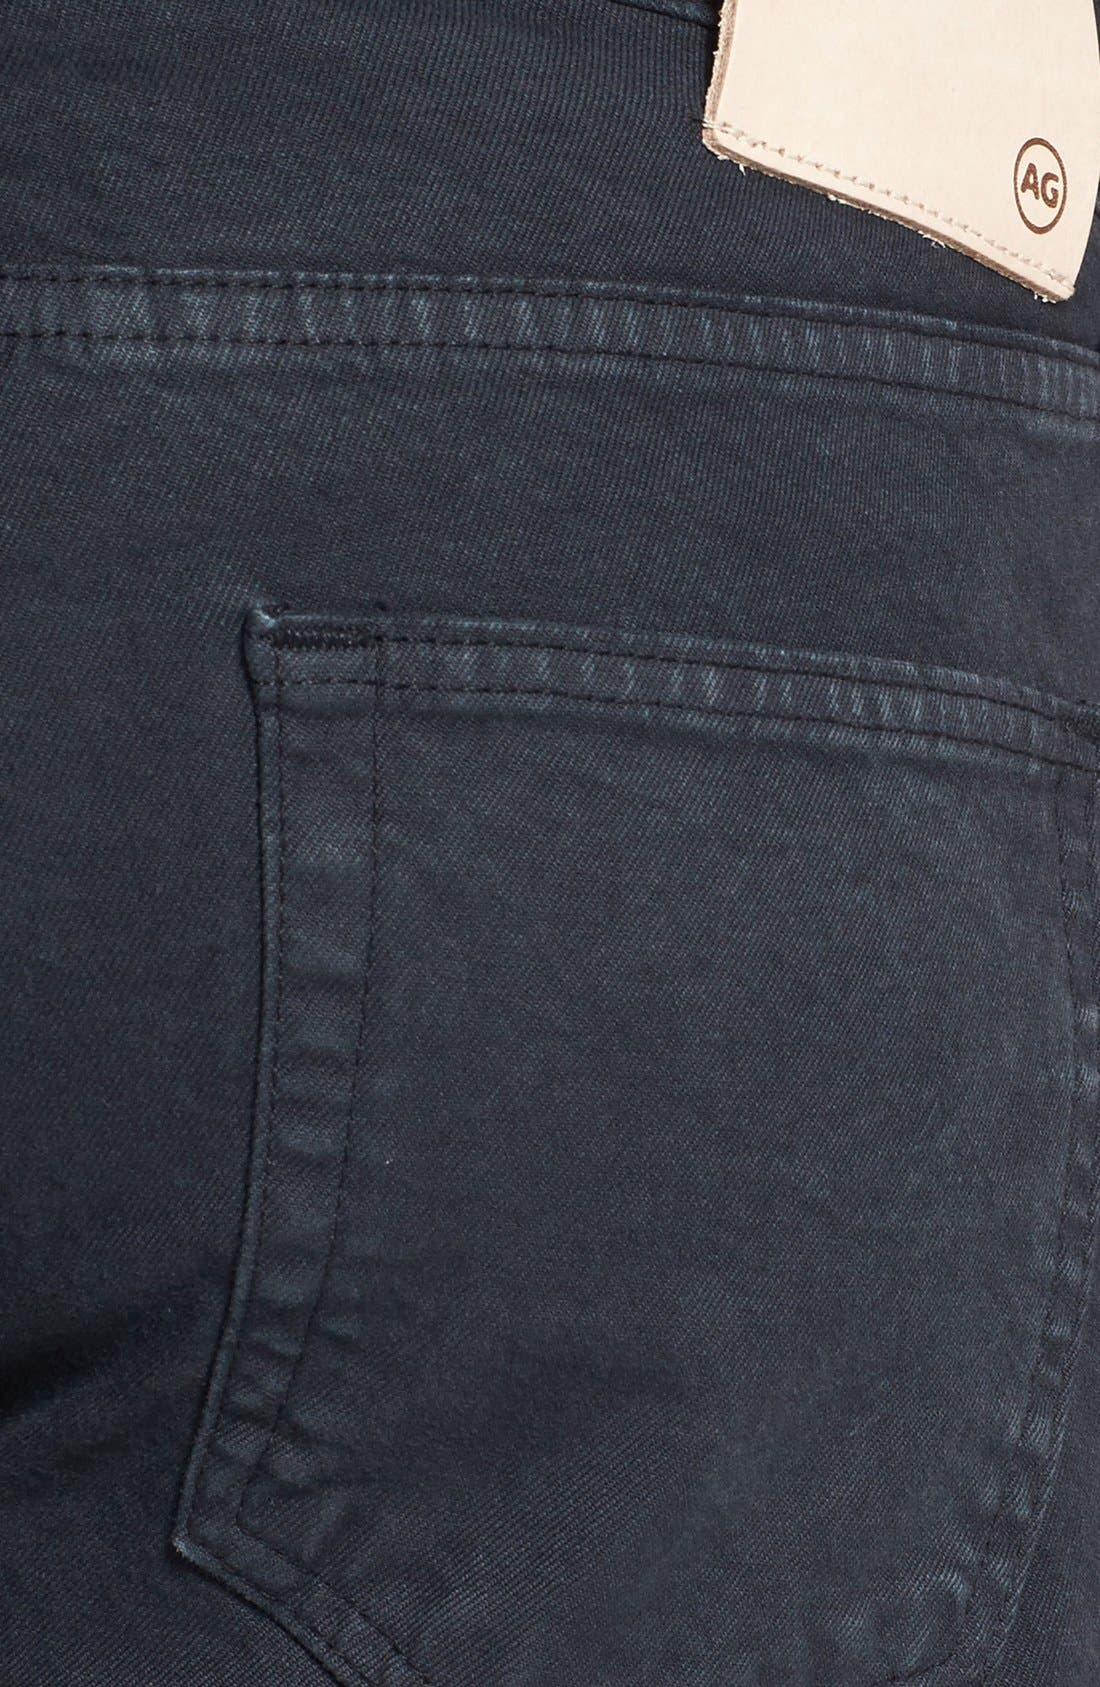 Alternate Image 4  - AG 'Matchbox' Slim Fit Selvedge Jeans (True Black)